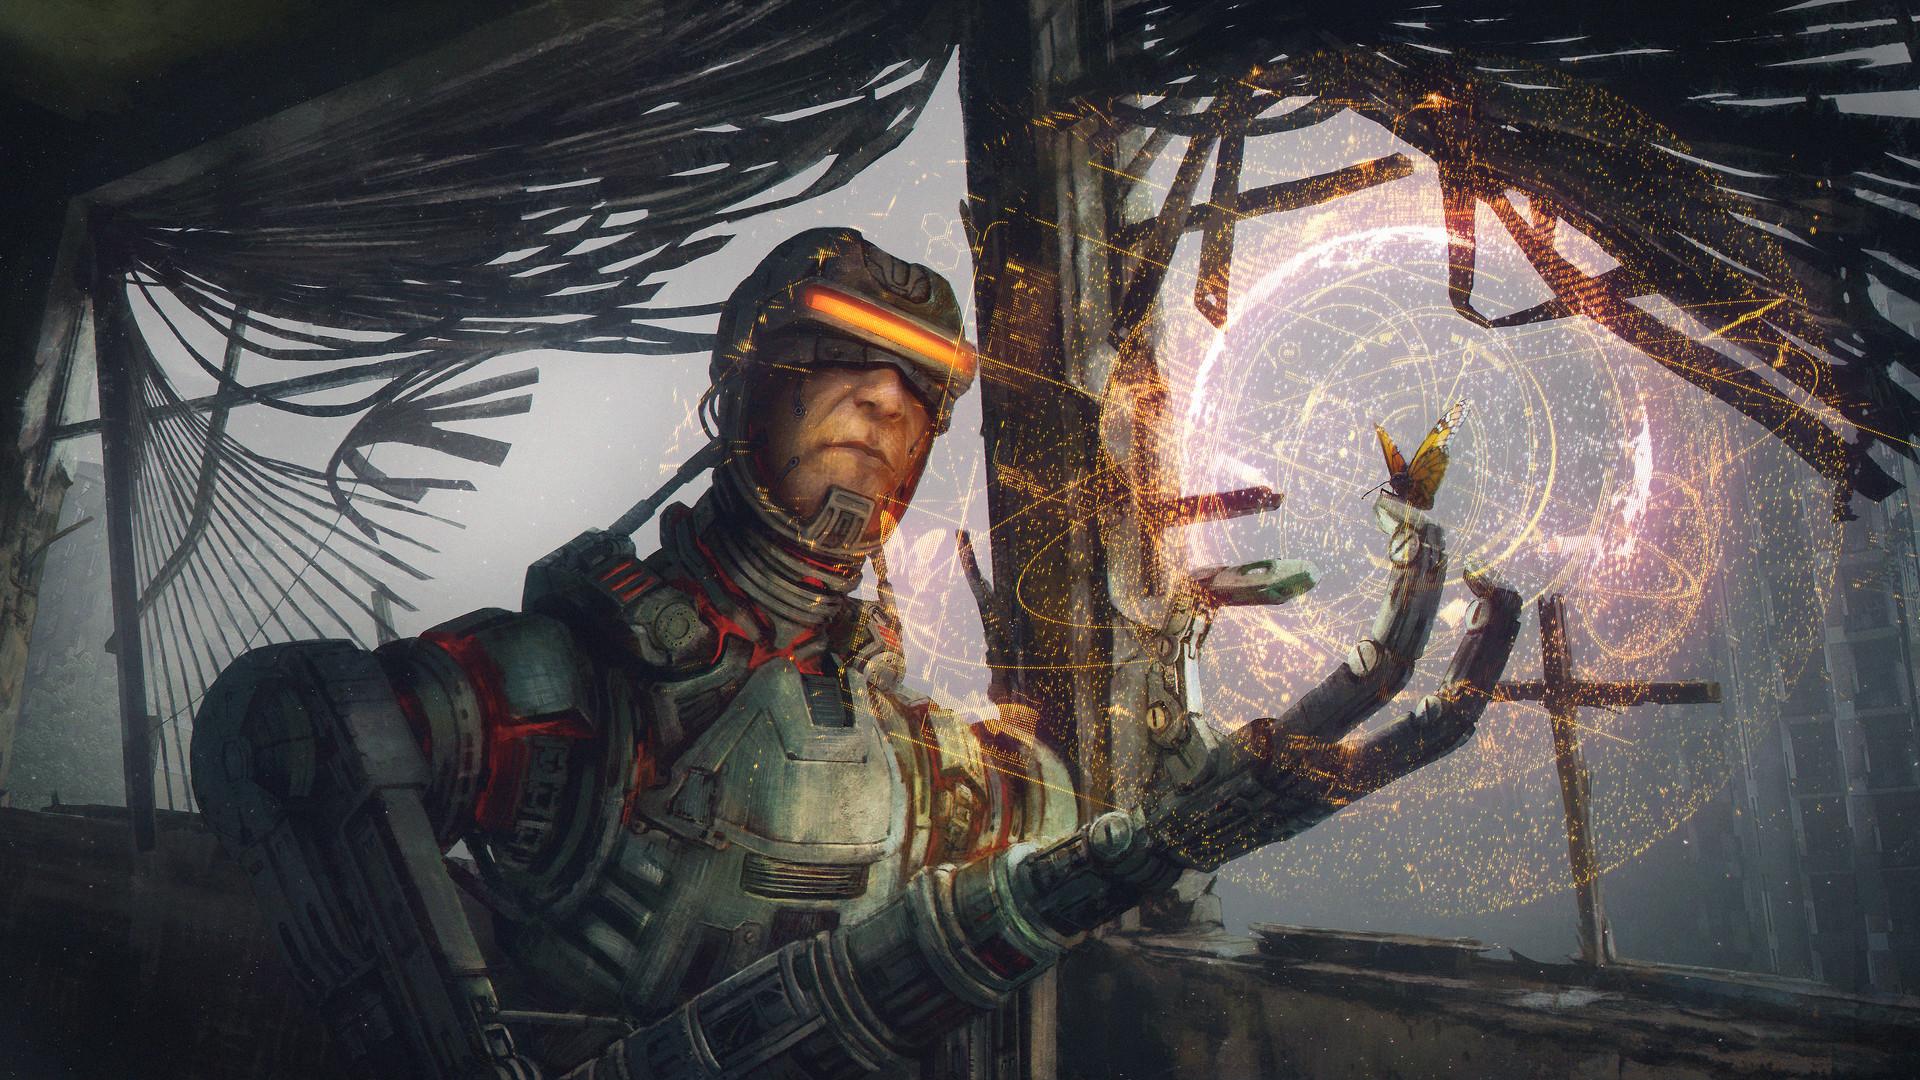 Vincenzo lamolinara a cyborg